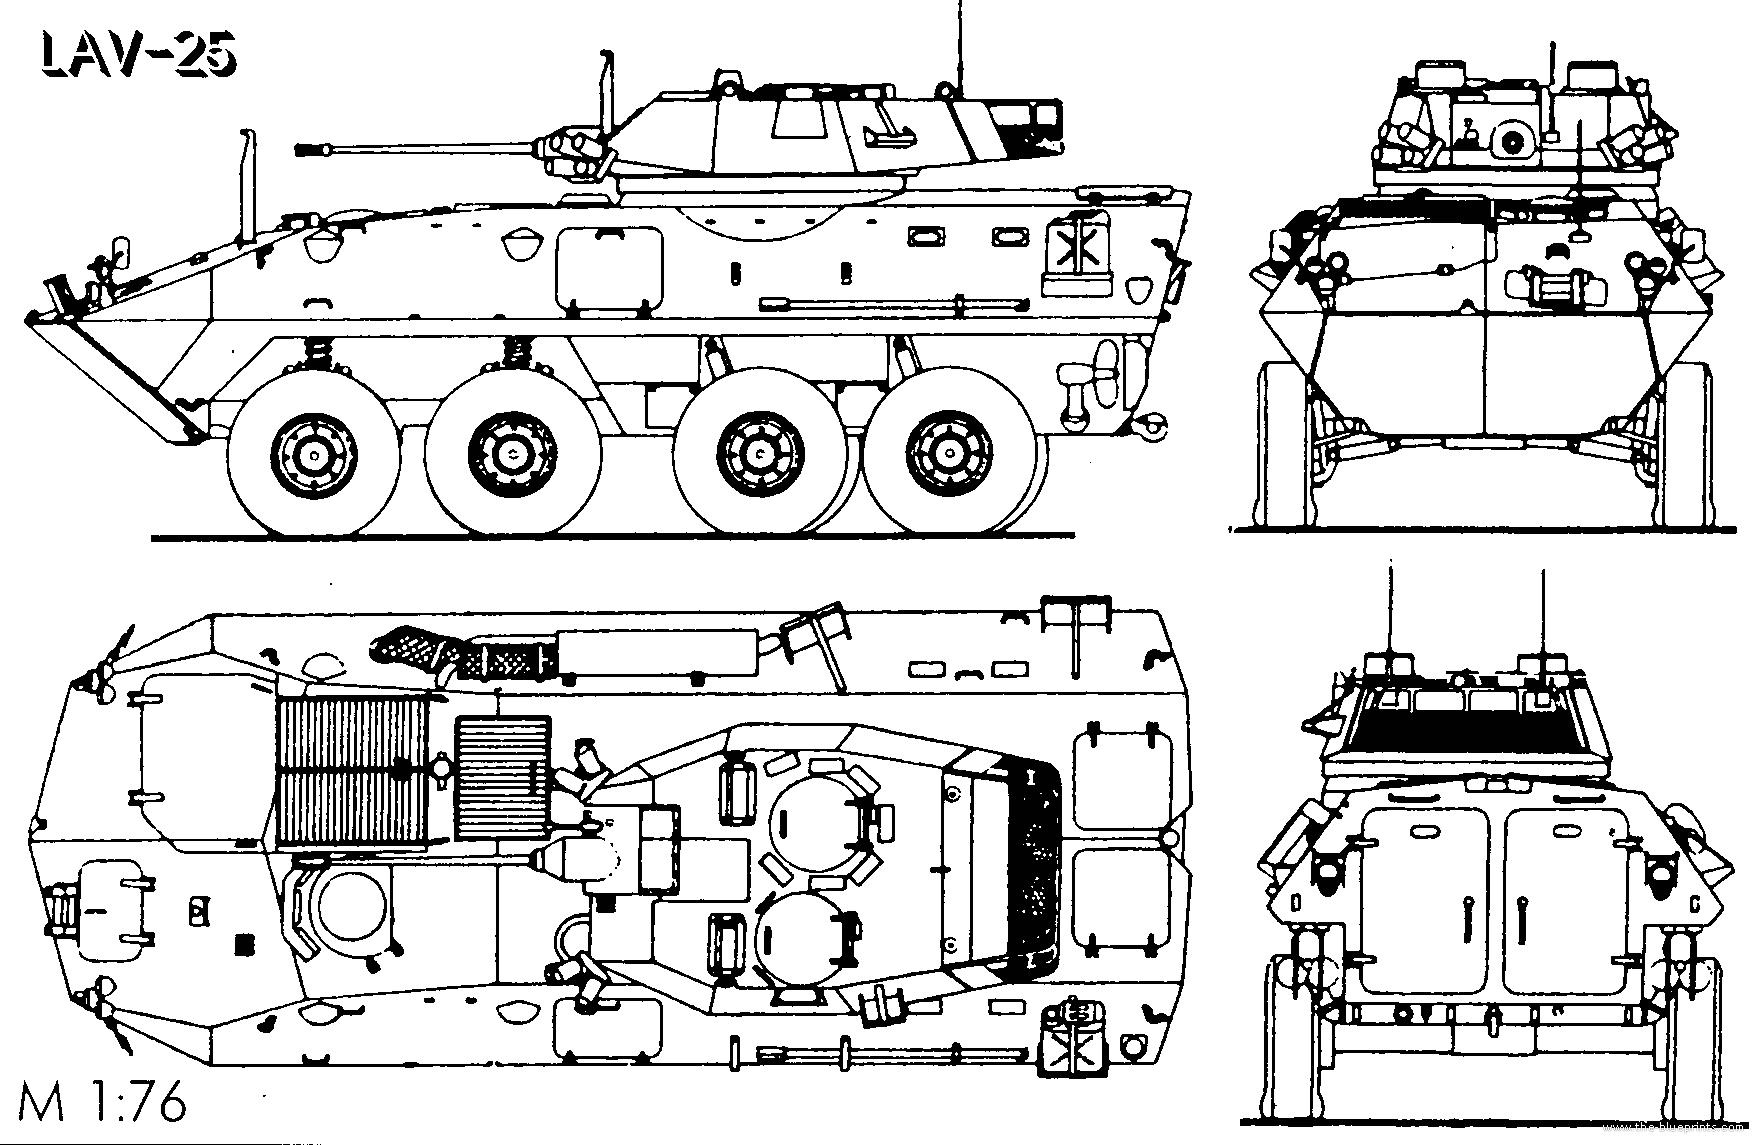 1000  ideas about Lav 25 on Pinterest | Lav Iii, Armoured ...